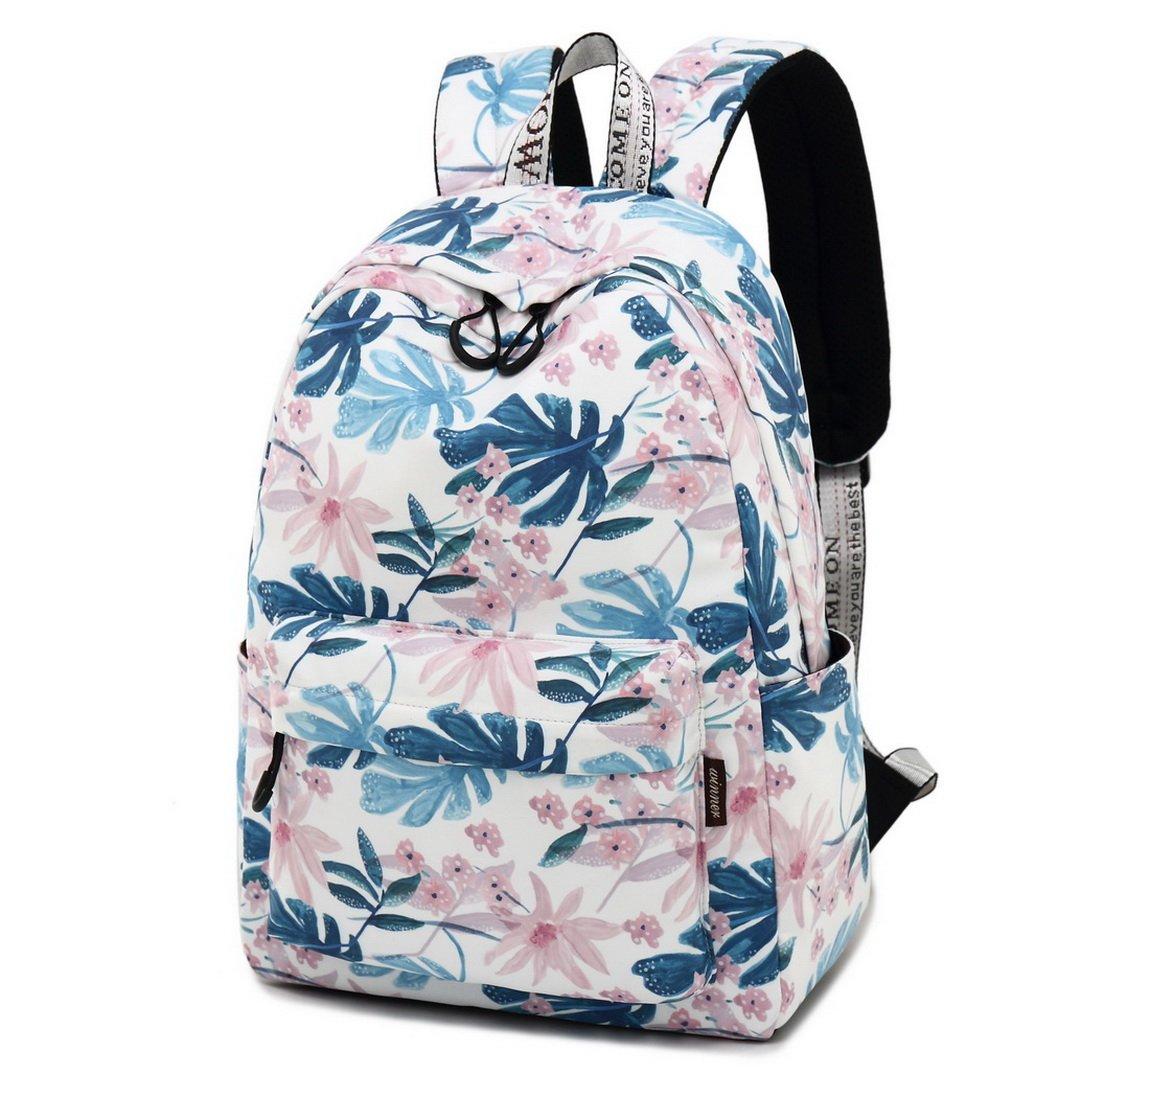 Amazon.com: Joymoze Leisure Backpack for Girls Teenage School Backpack Women Backpack Purse (Cute Flower): Toys & Games